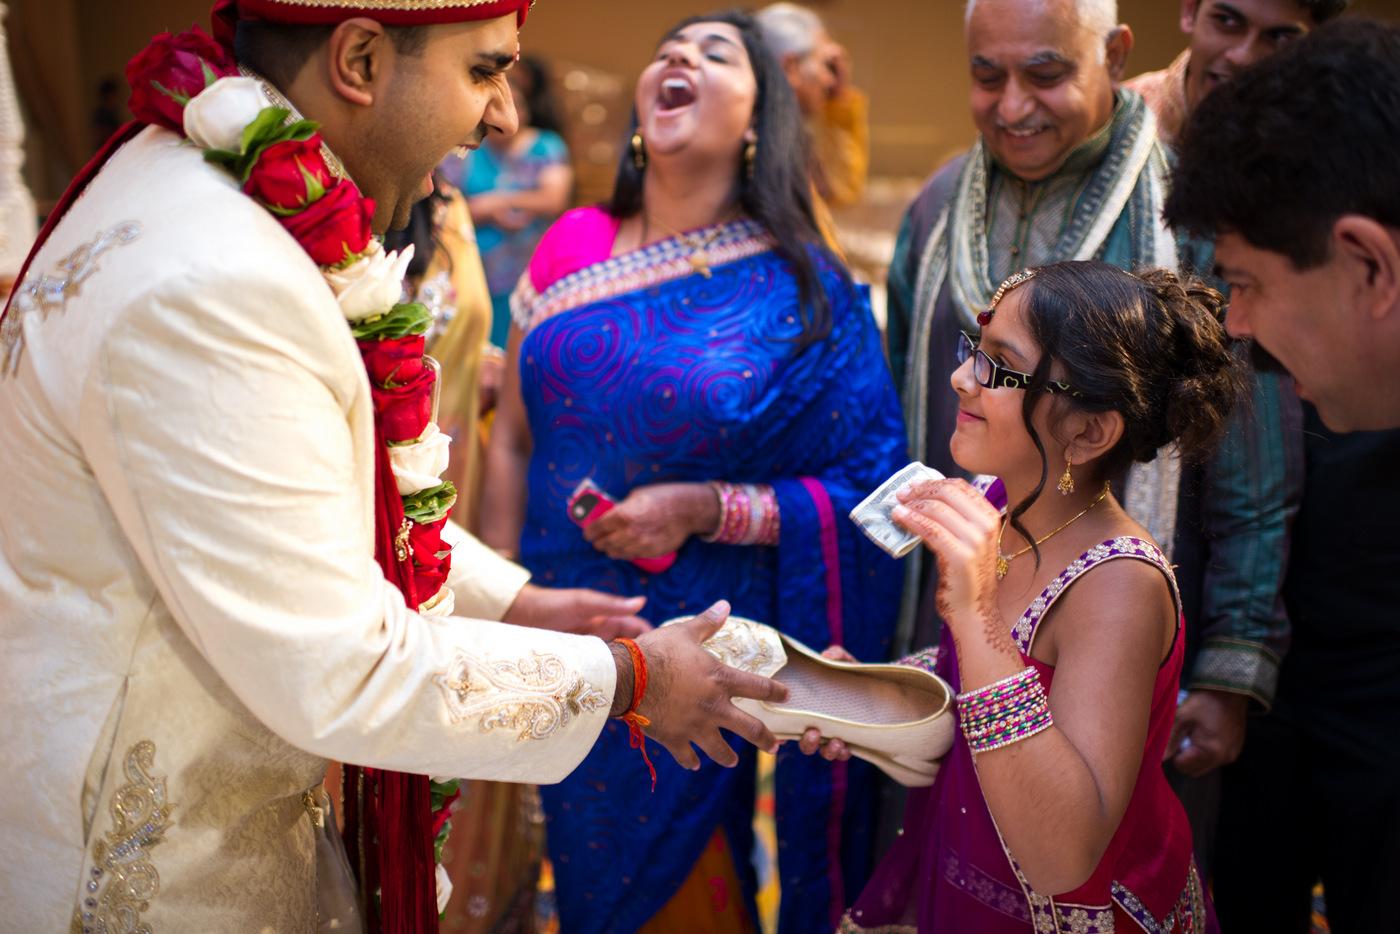 Hindu Indian Wedding | Chicago | Akanksha + Riten, Miami Wedding Photographers | Häring Photography, Indian Wedding Photographer in Florida, Best Muslim, Hindu - South East Asian Wedding Photographers